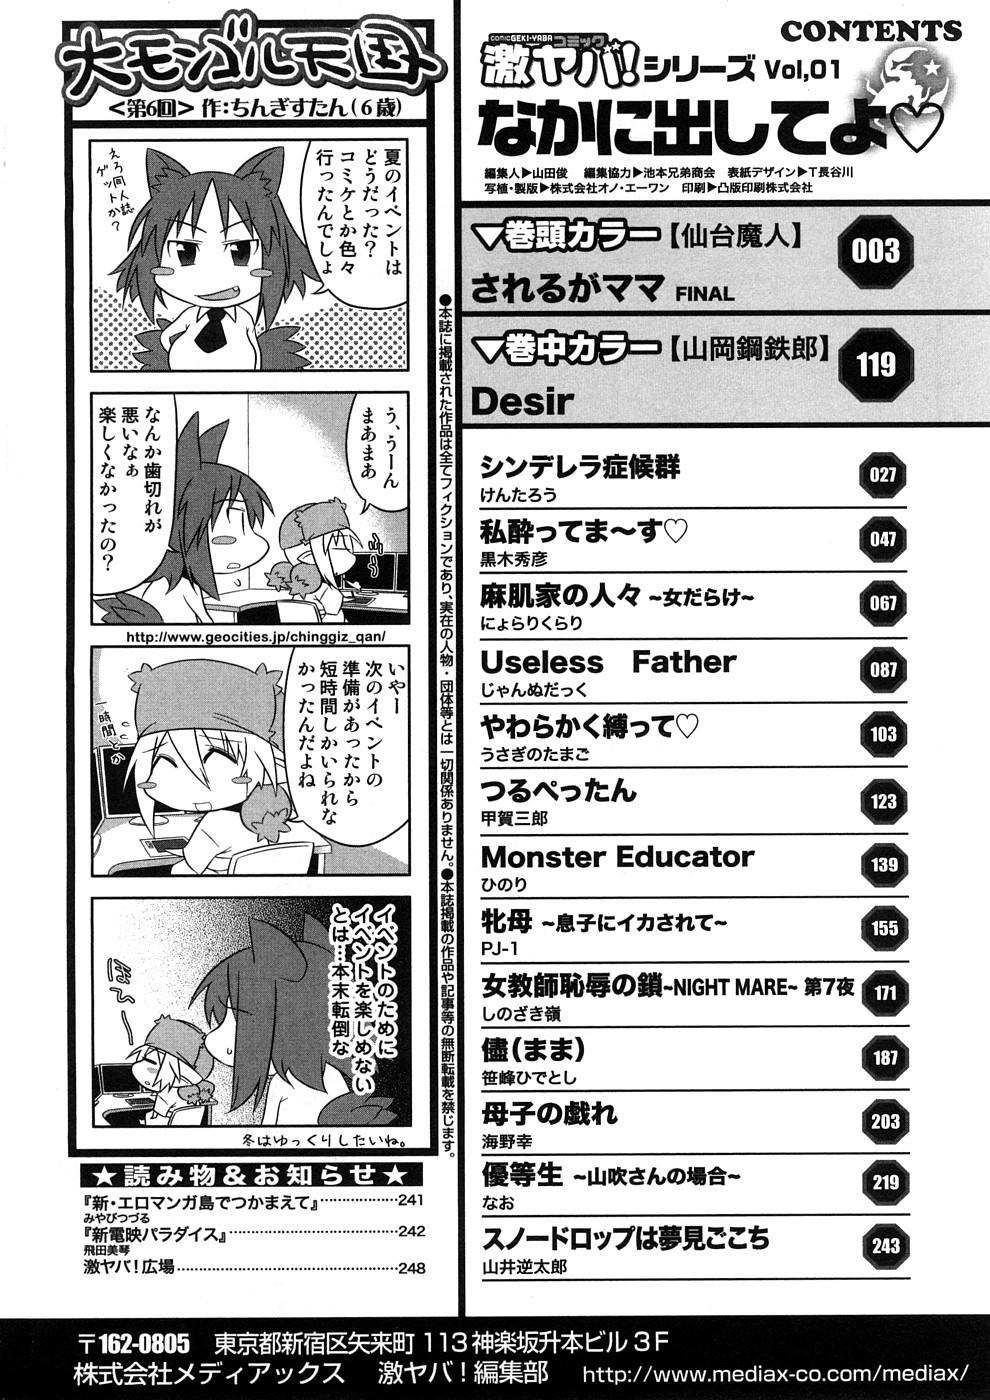 Geki Yaba Anthology Vol. 1 - Naka ni Dashite yo 250